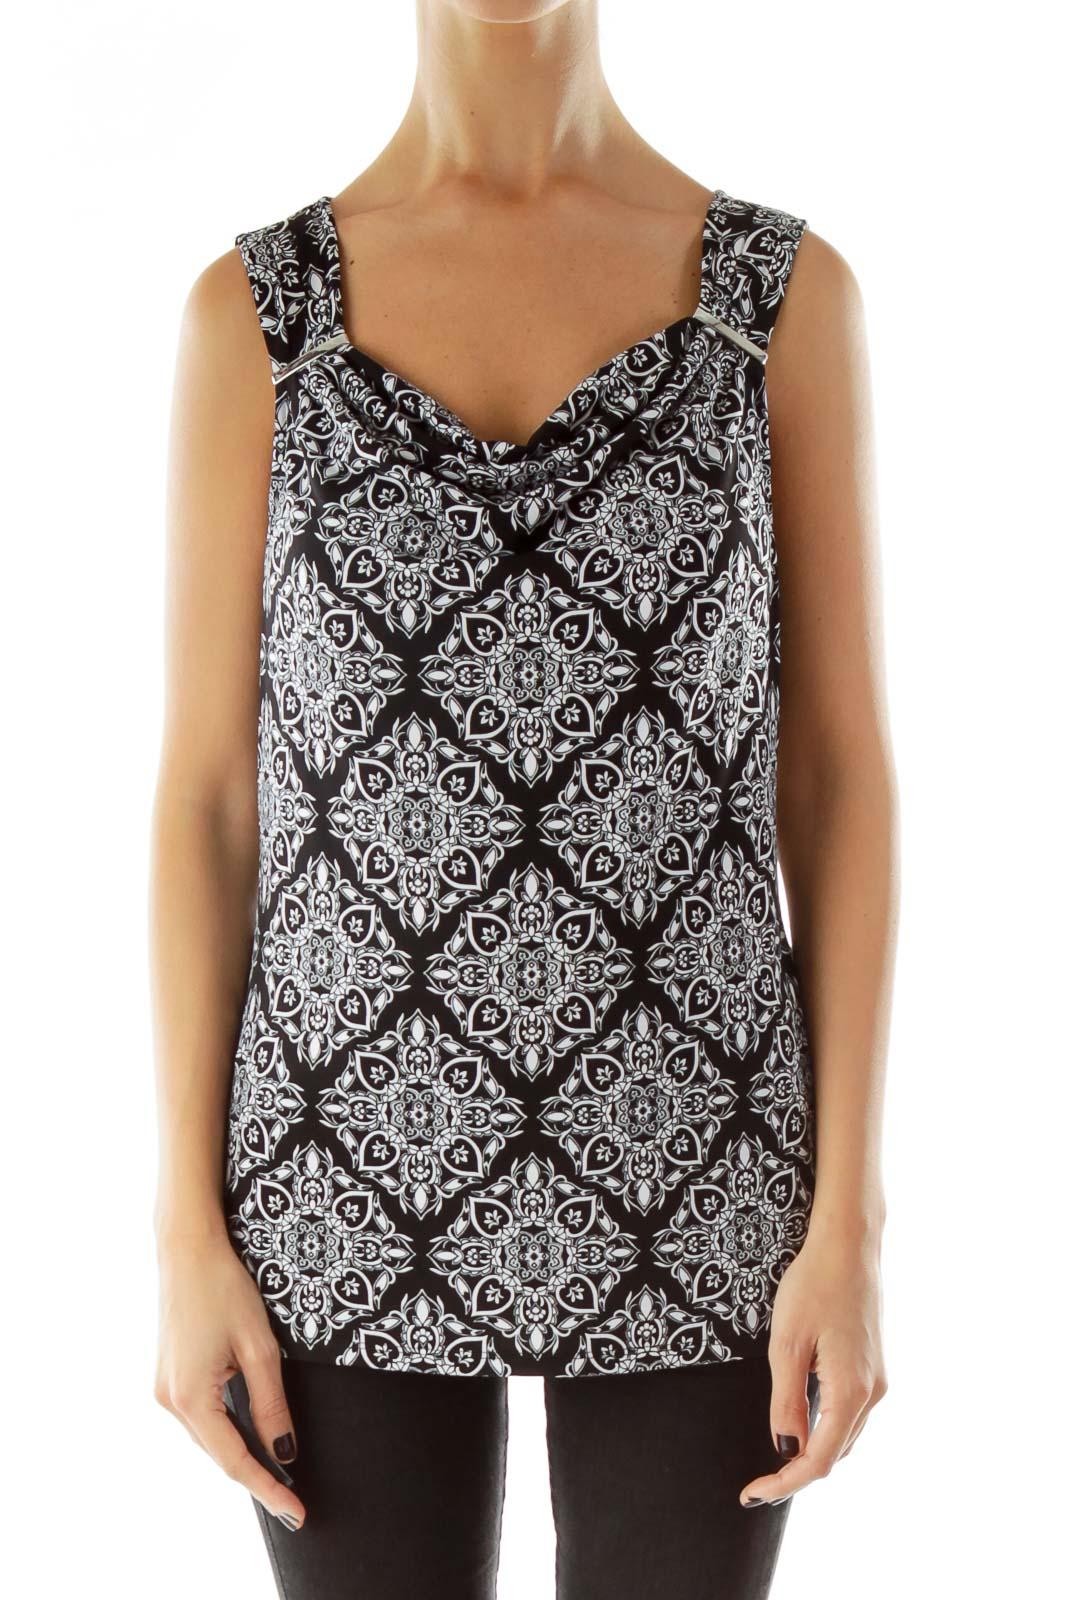 Black White Jewel Neckline Top